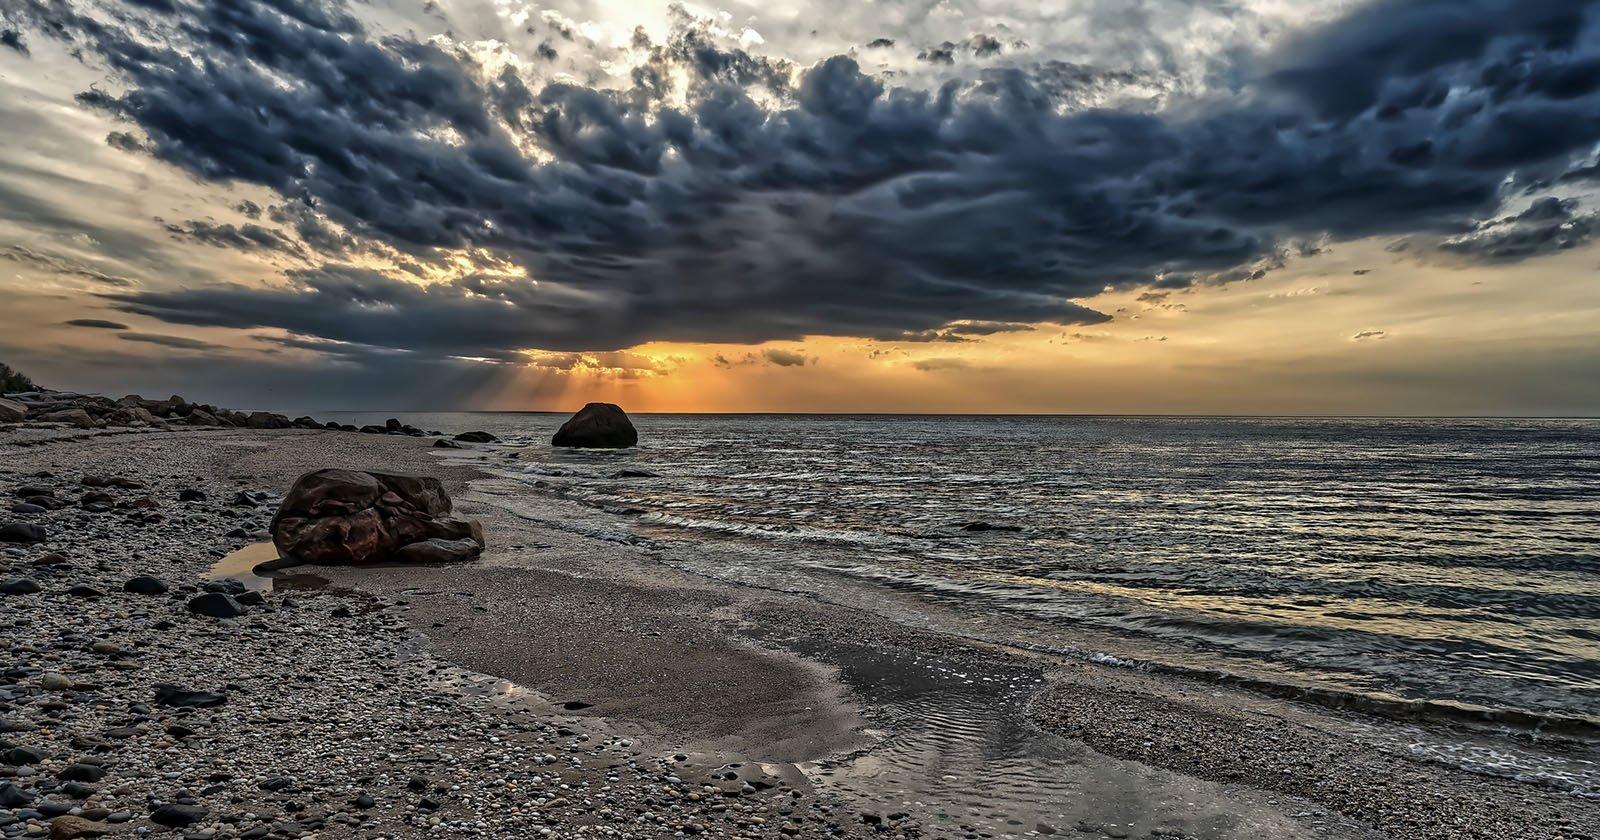 The Best Photos from GuruShots' 'Beach Days' Challenge